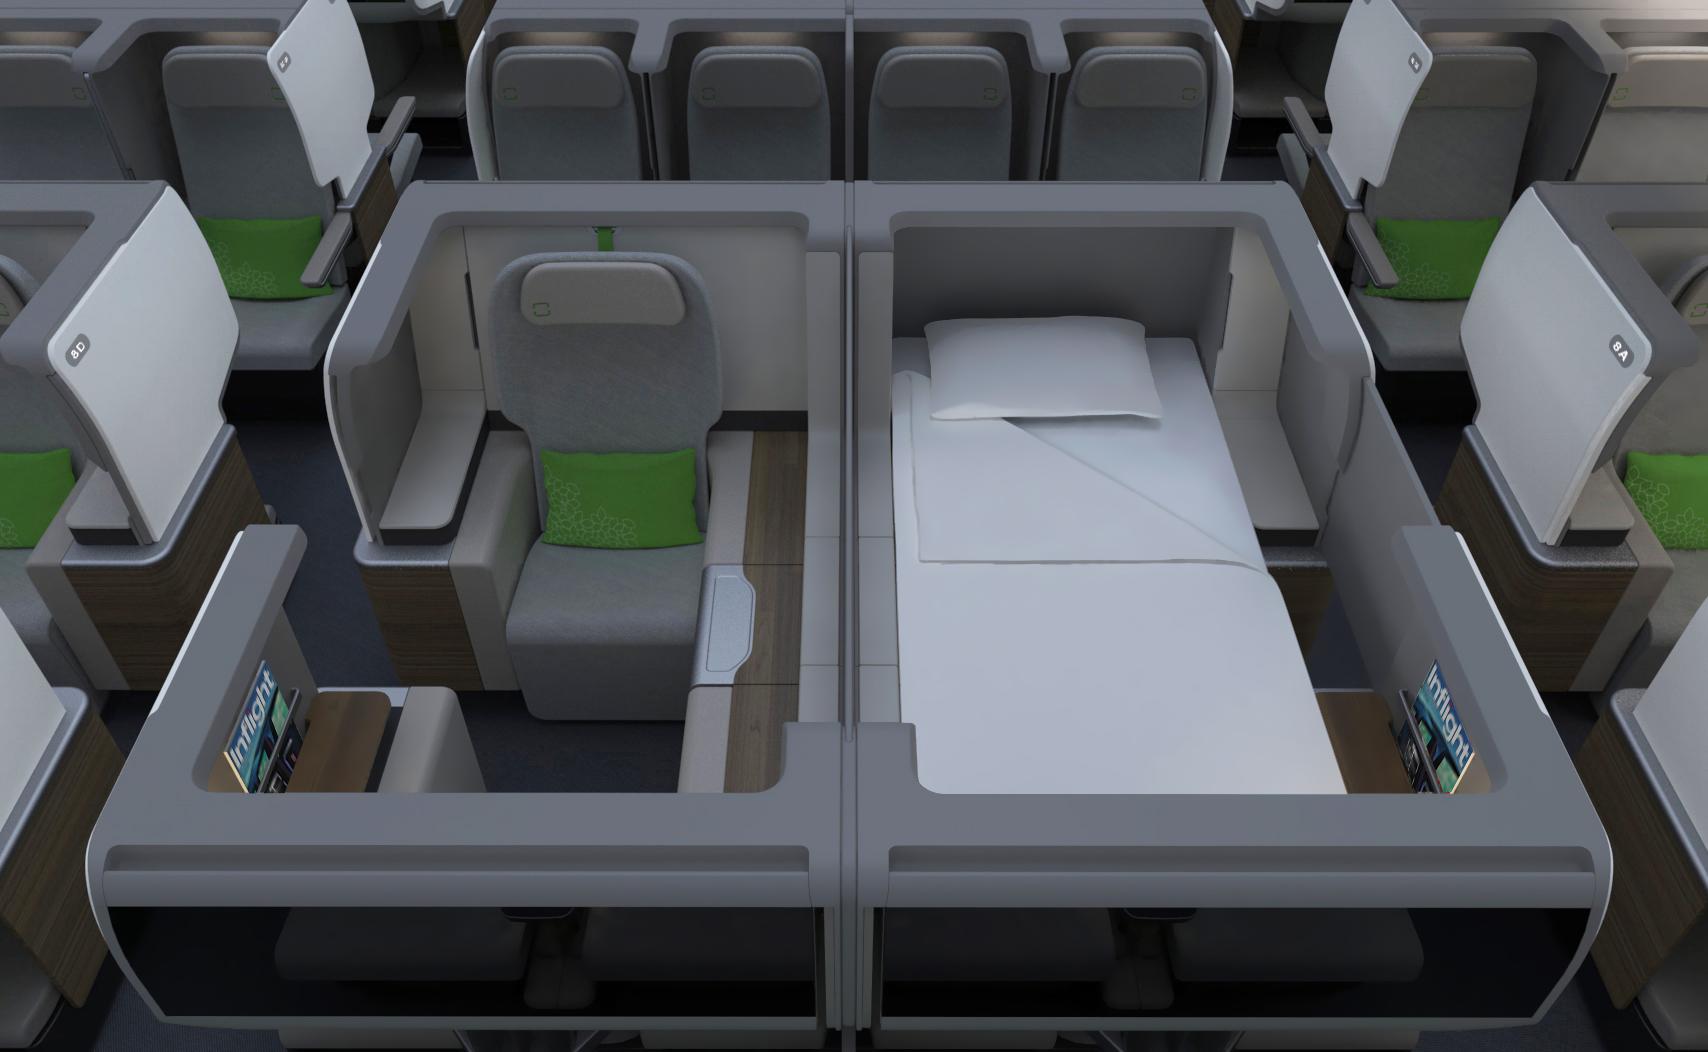 Formation_Design_Group_concept_seat-cabin-2suites-1-1.jpg